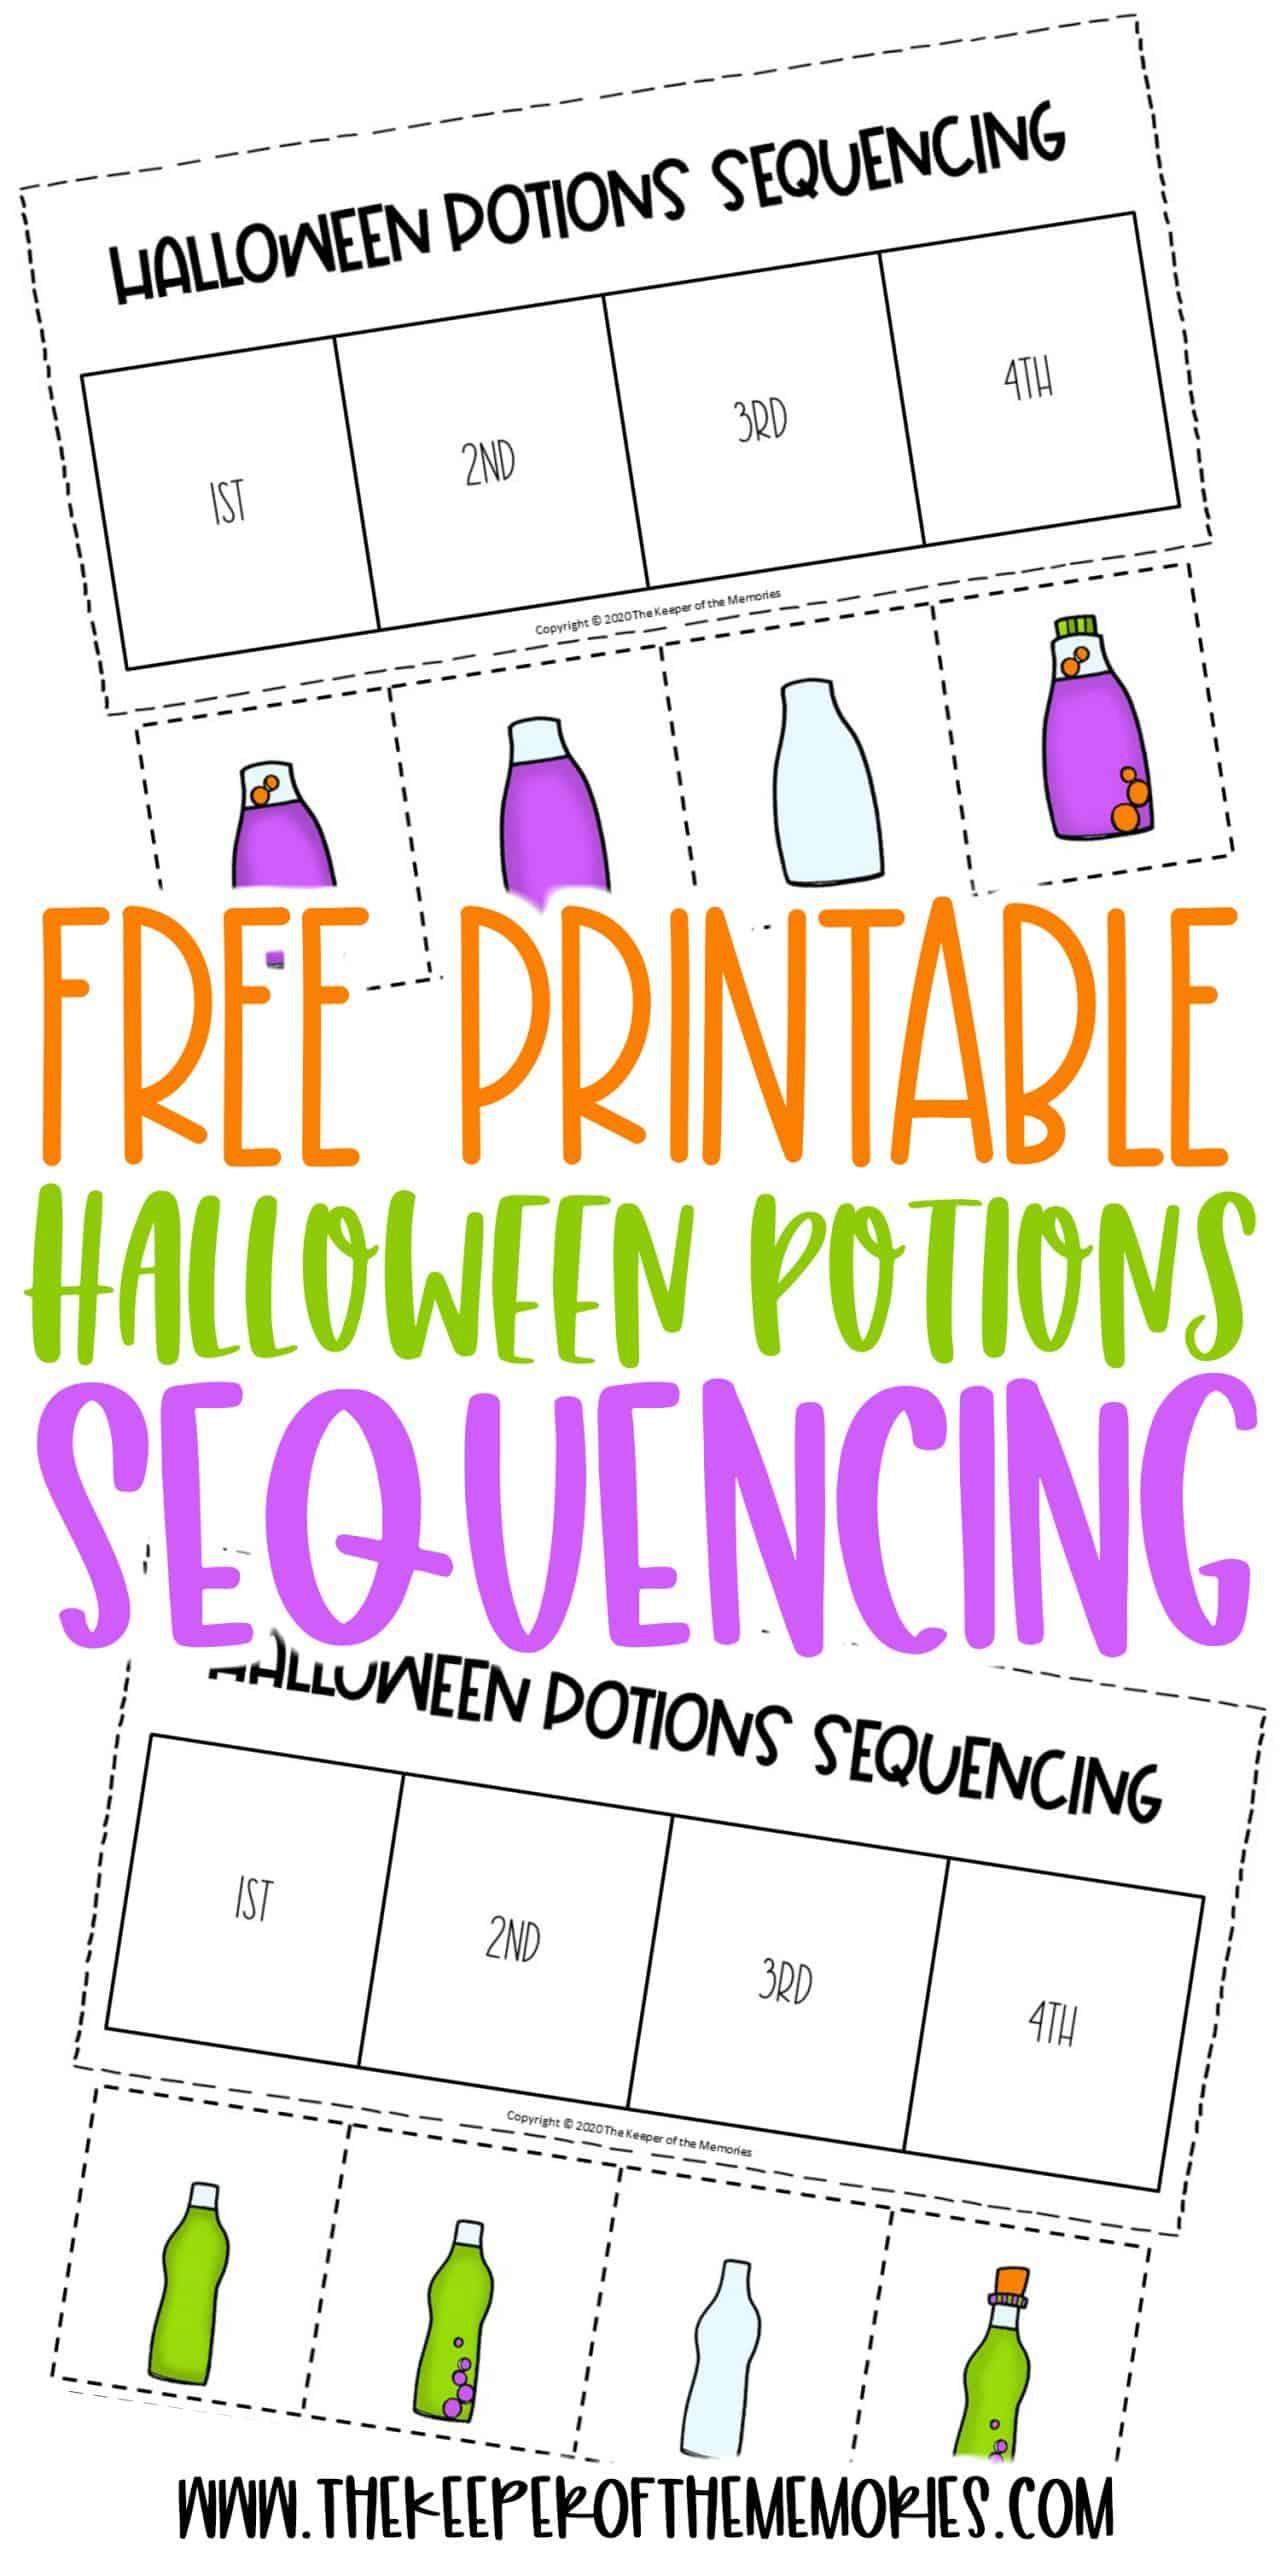 Free Printable Potions Sequencing Halloween Preschool Worksheets